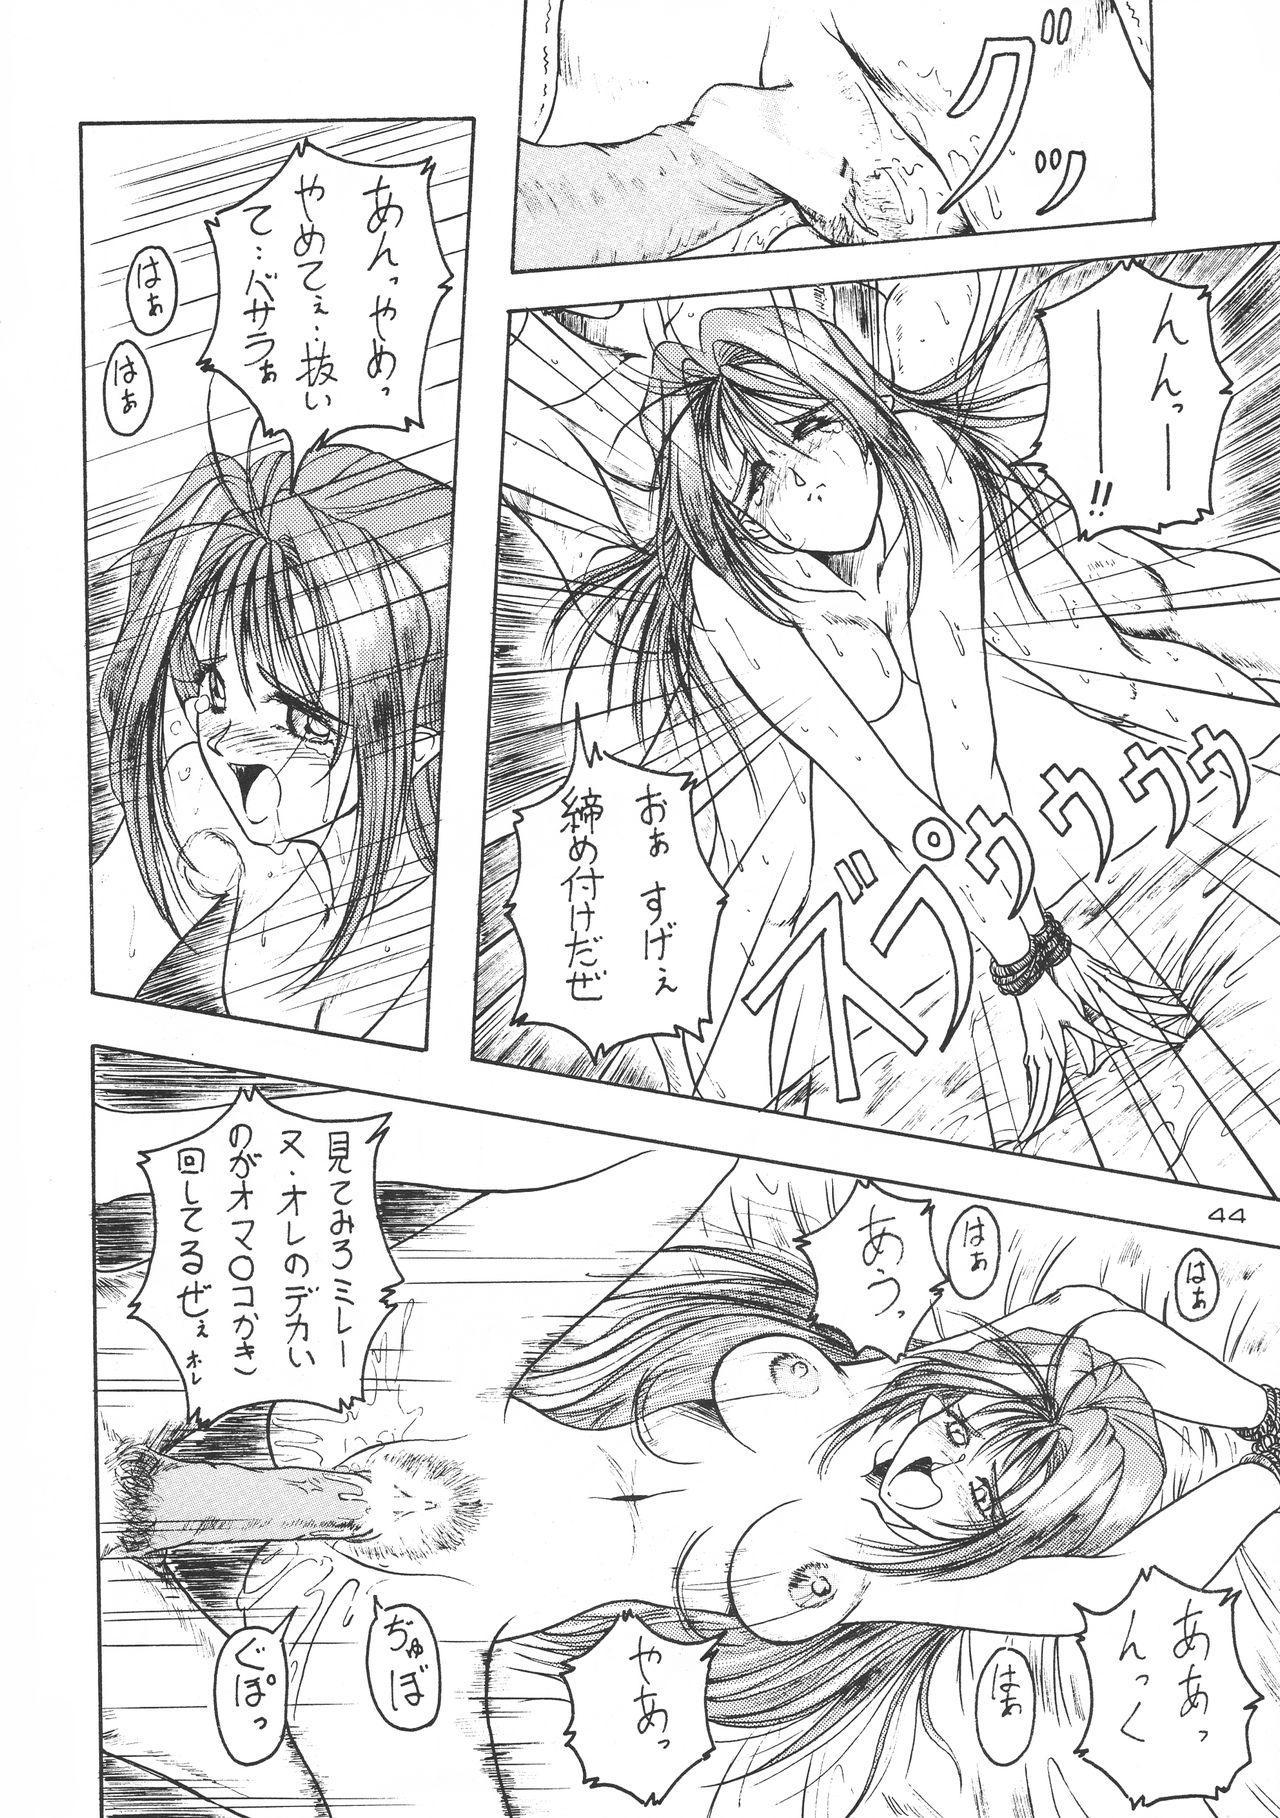 (C51) [J's Style (Jamming)] D2 (DOUBT TO DOUBT) Jamming Kojinshi 4 -Ditsuu- (Various) 43